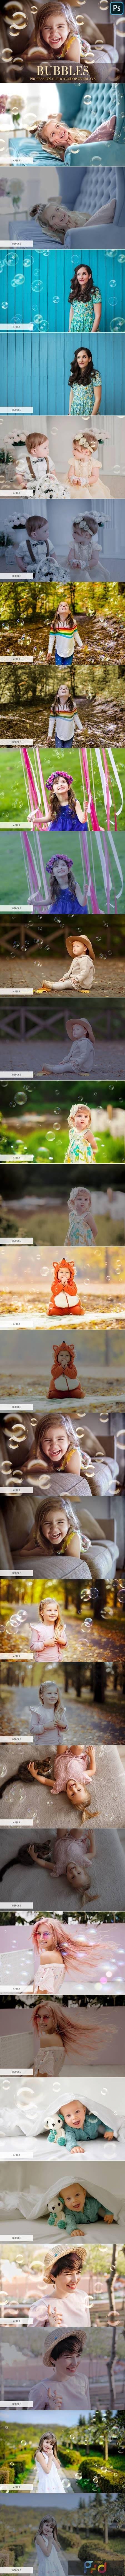 Bubbles Overlays Photoshop 4942673 1